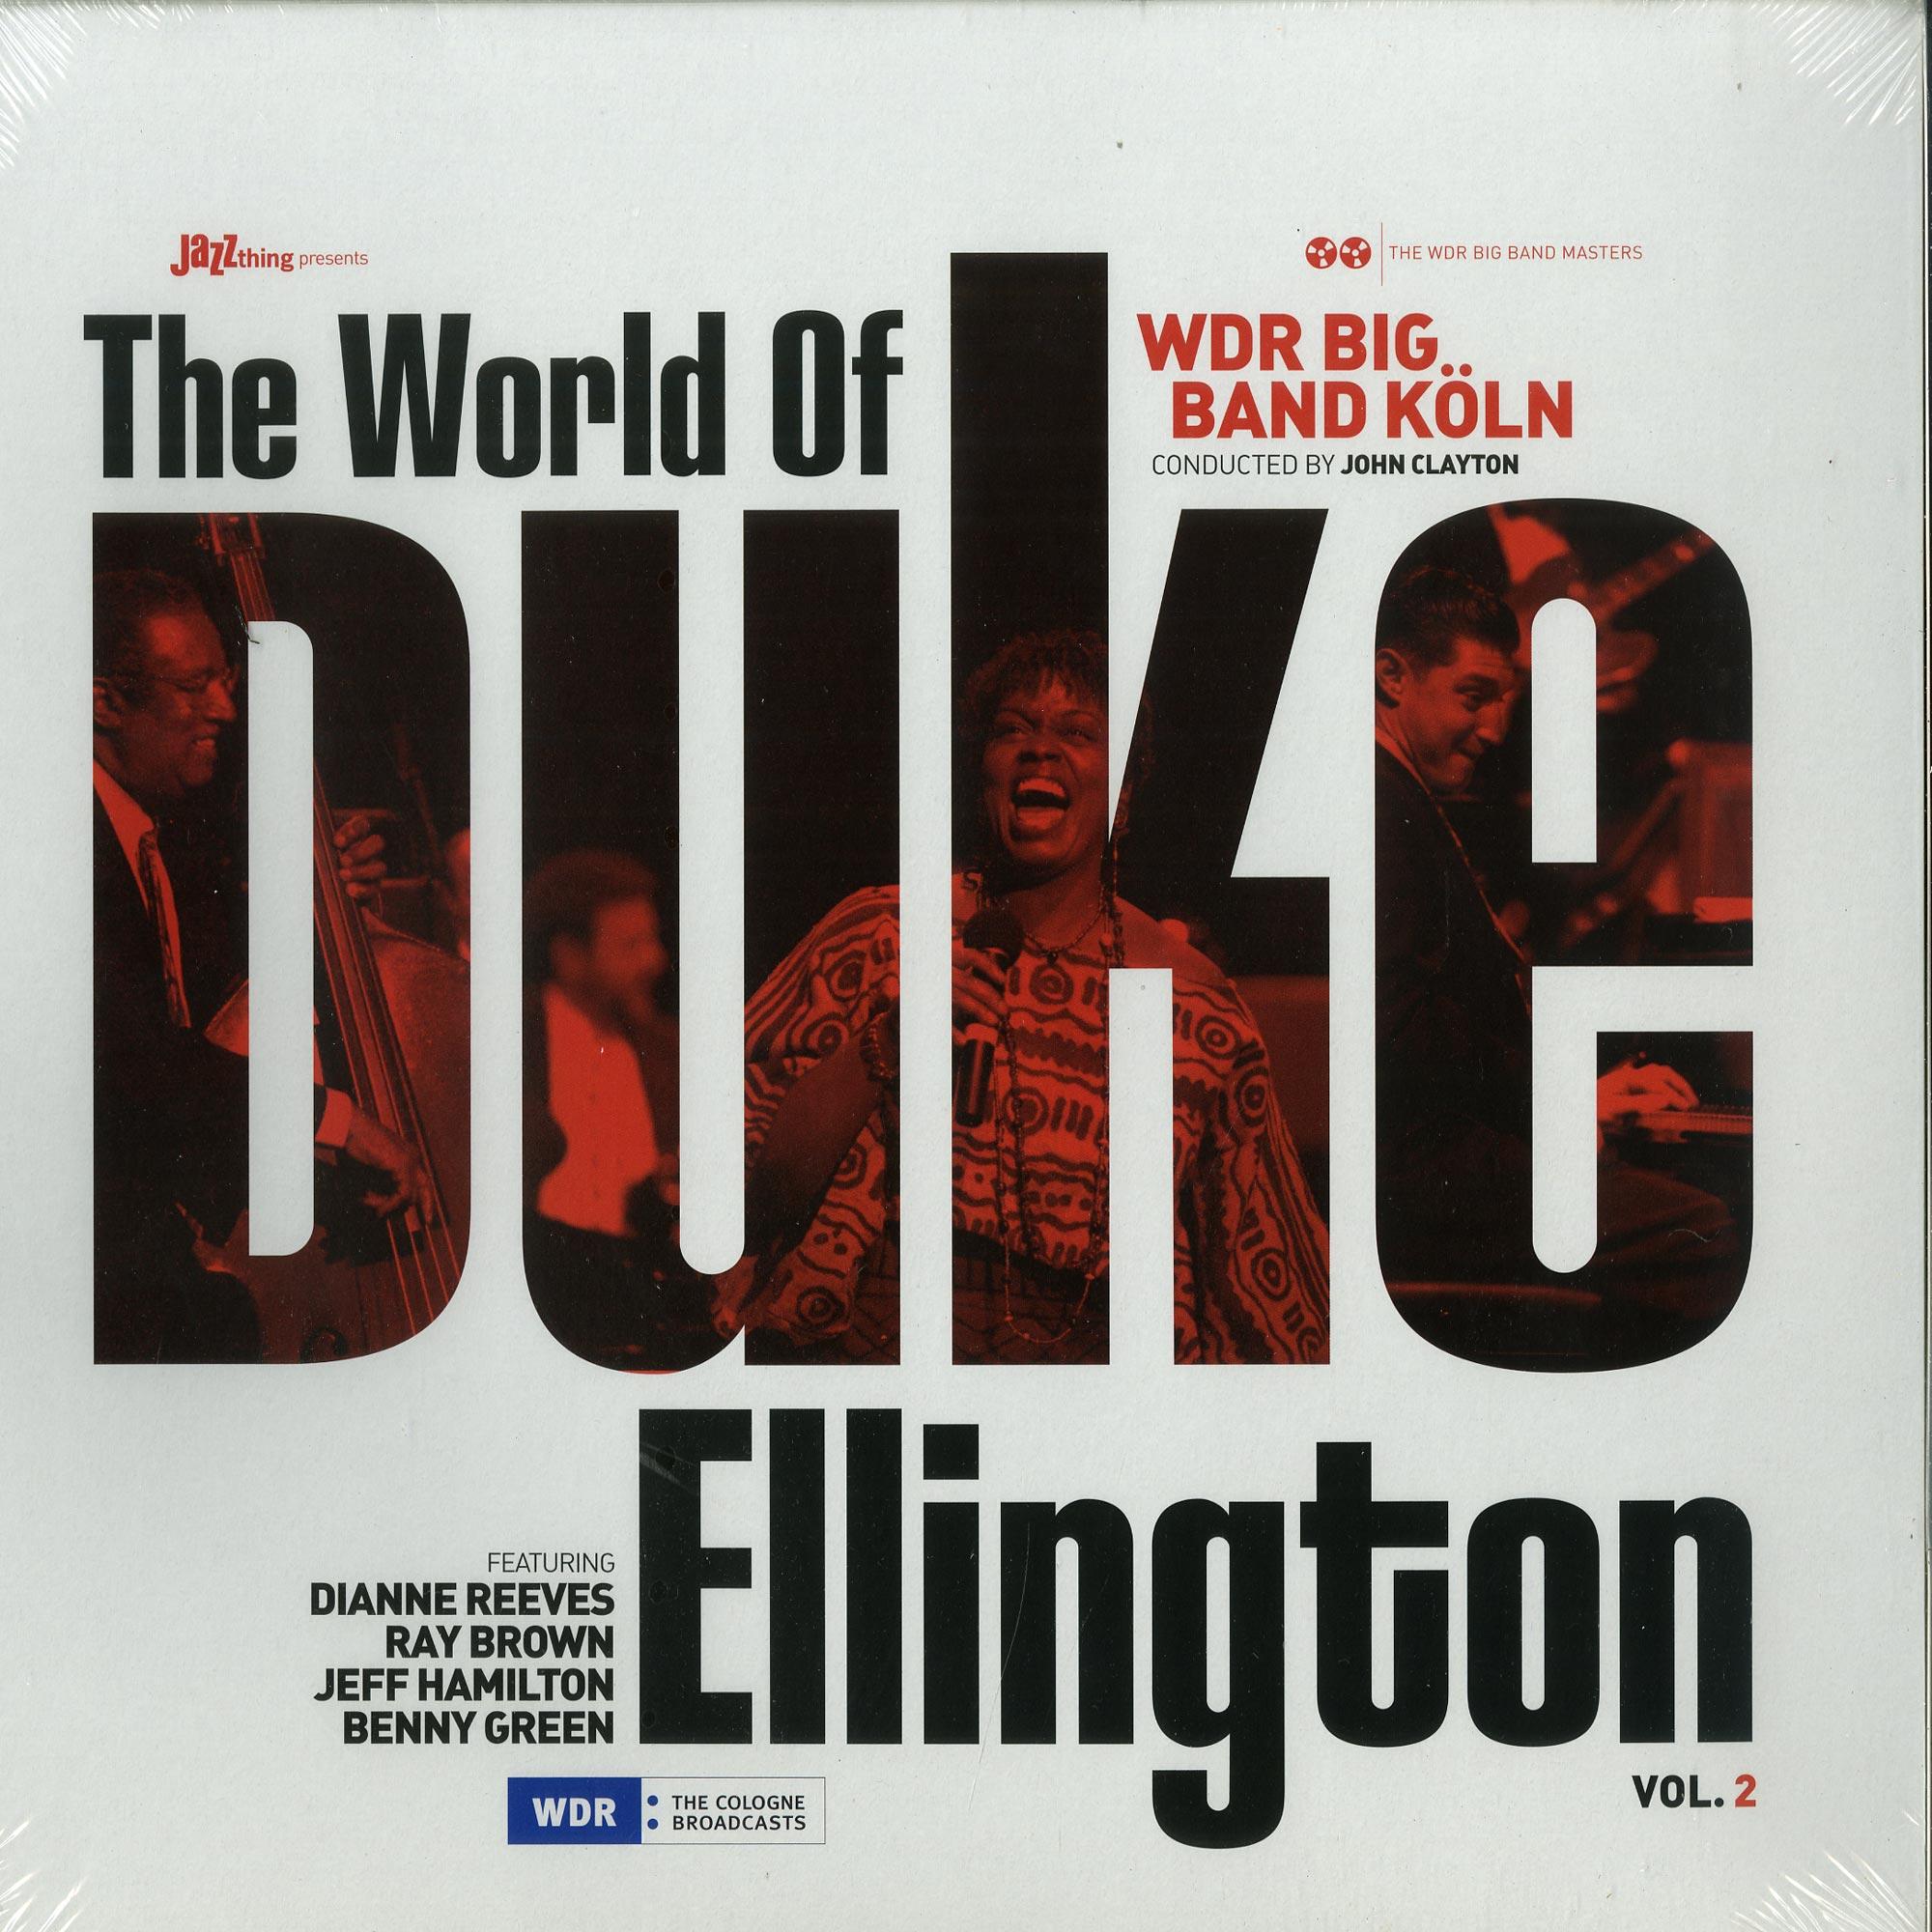 WDR Big Band Köln - THE WORLD OF DUKE ELLINGTON PART 2